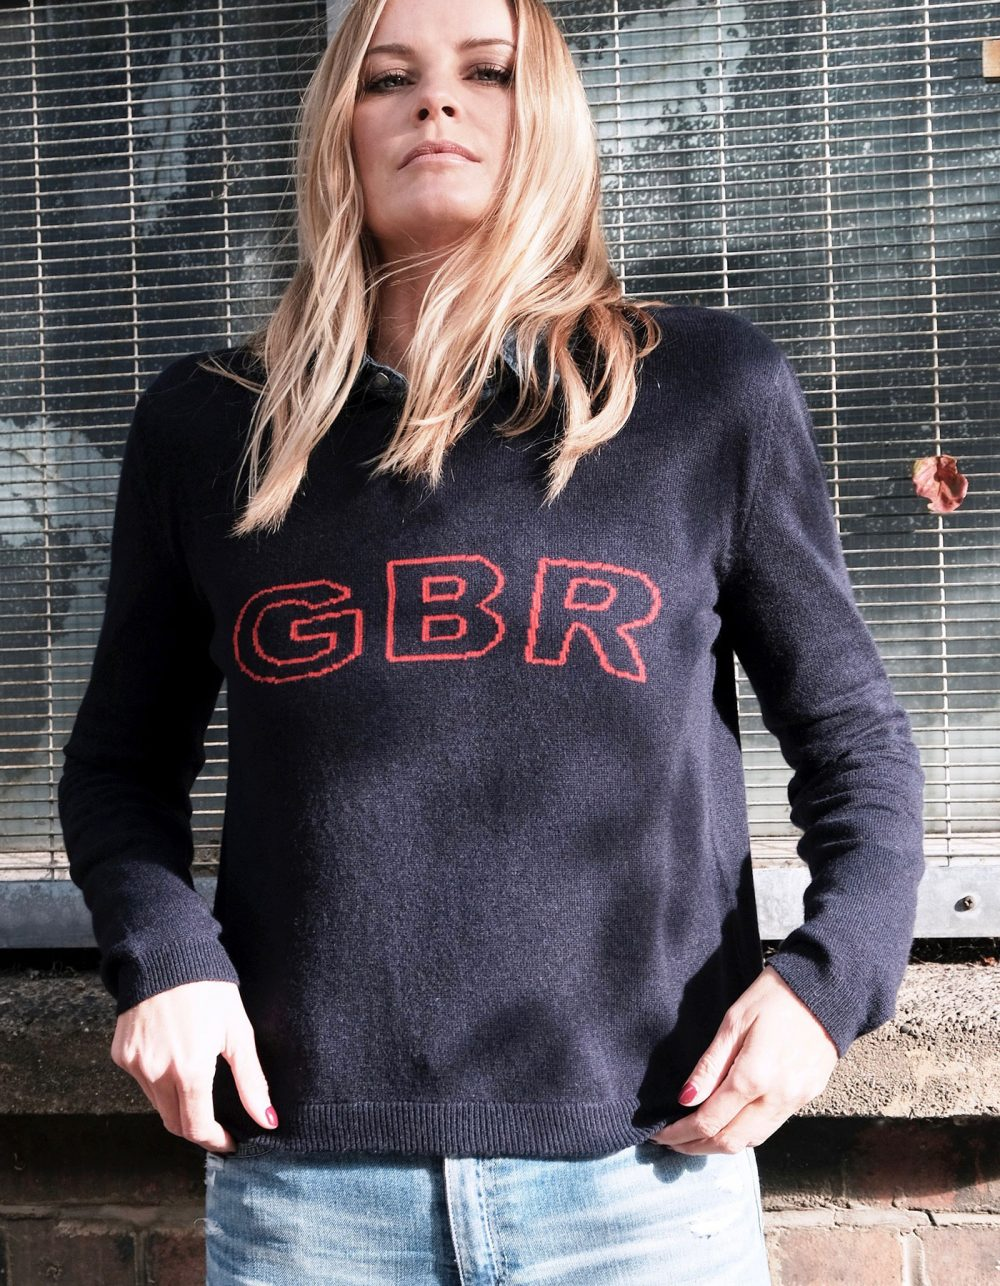 GBR Cashmere Intarsia by Malin Darlin